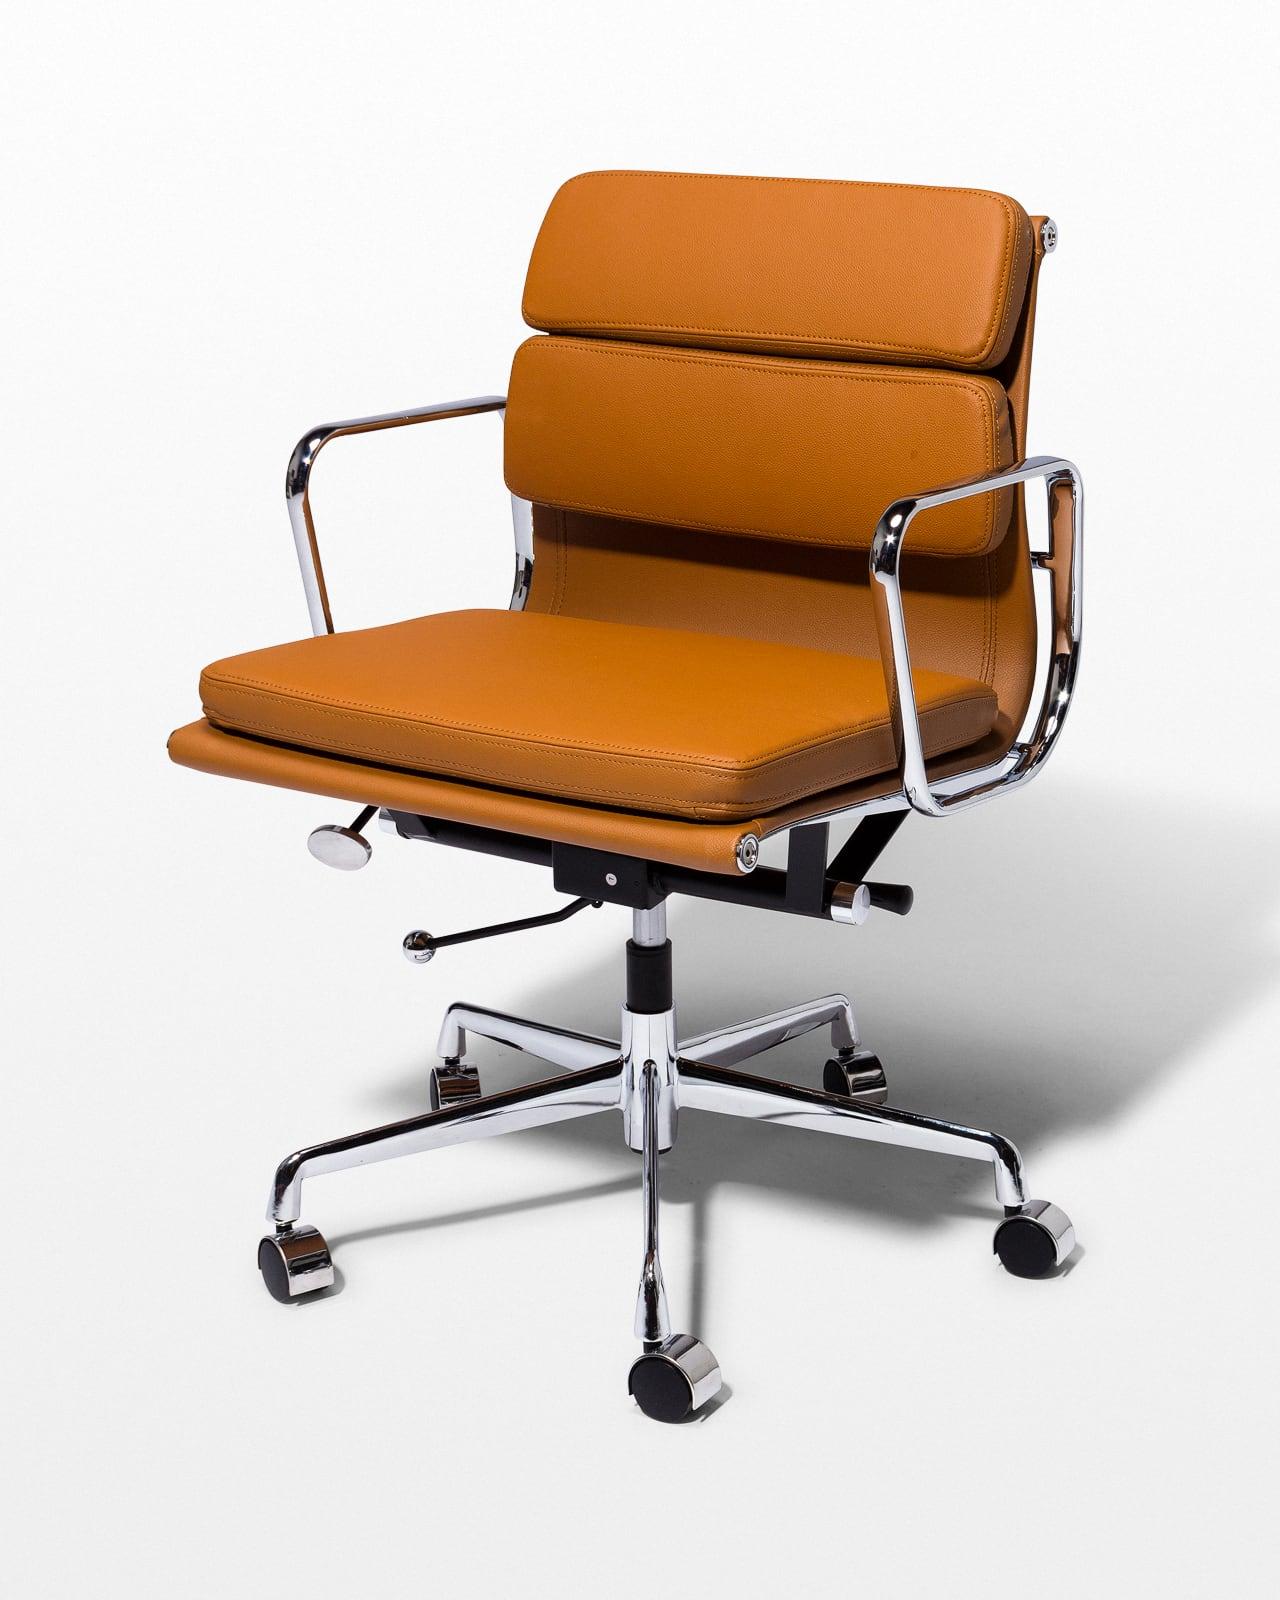 Merveilleux Front View Of Halpert Brown Leather Rolling Desk Chair ...